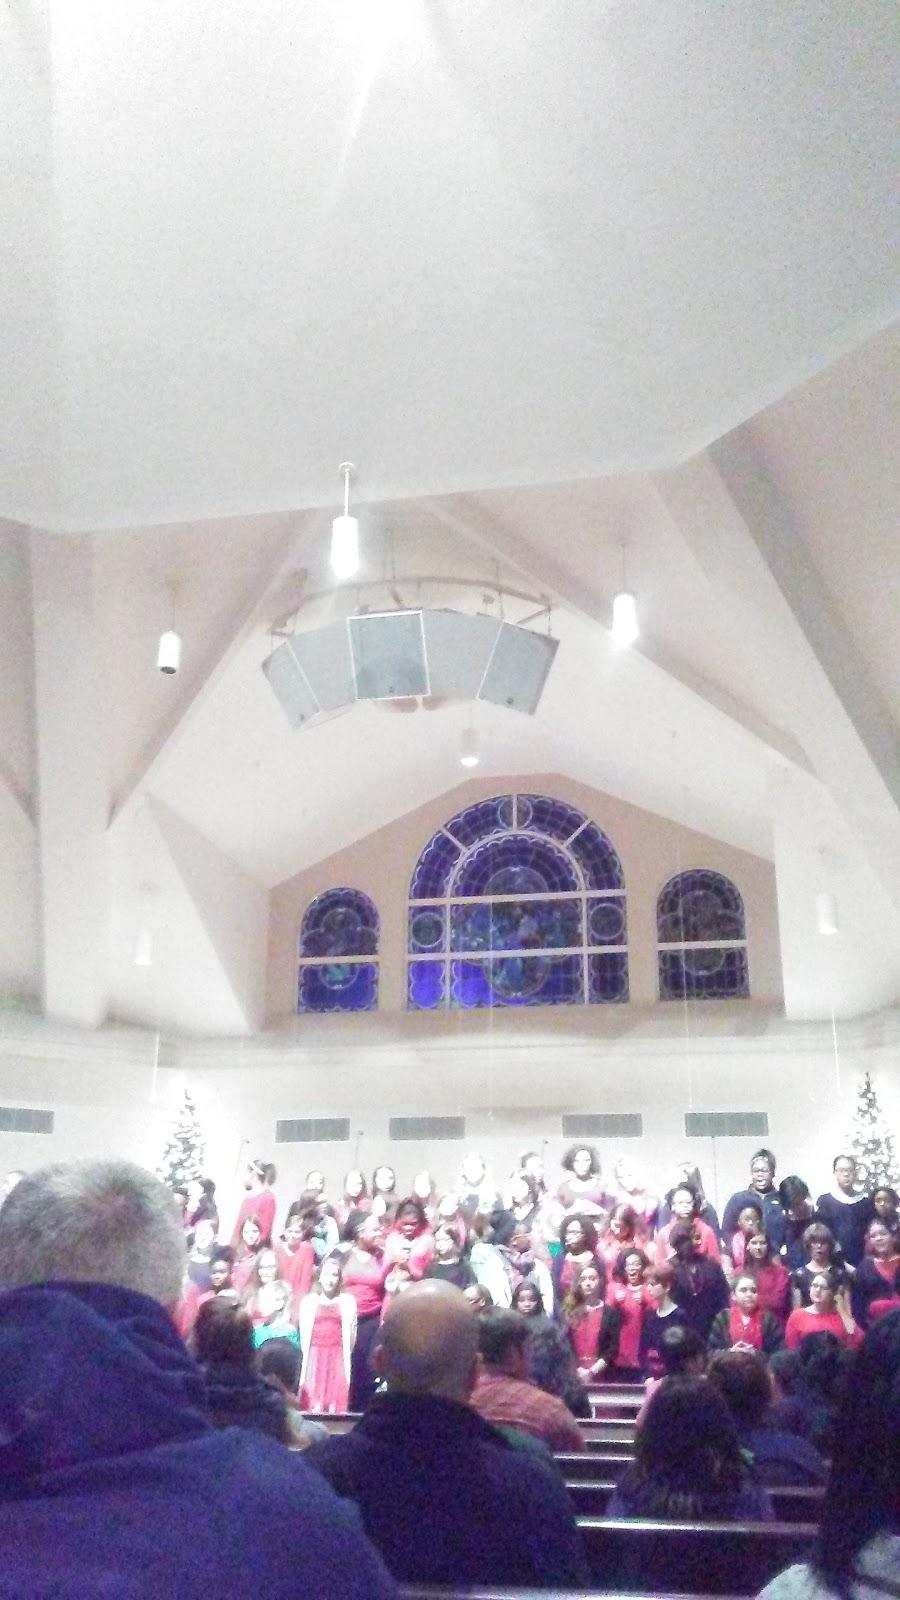 Maples Memorial United Methodist Church - church  | Photo 9 of 10 | Address: 8745 Goodman Rd, Olive Branch, MS 38654, USA | Phone: (662) 895-2279